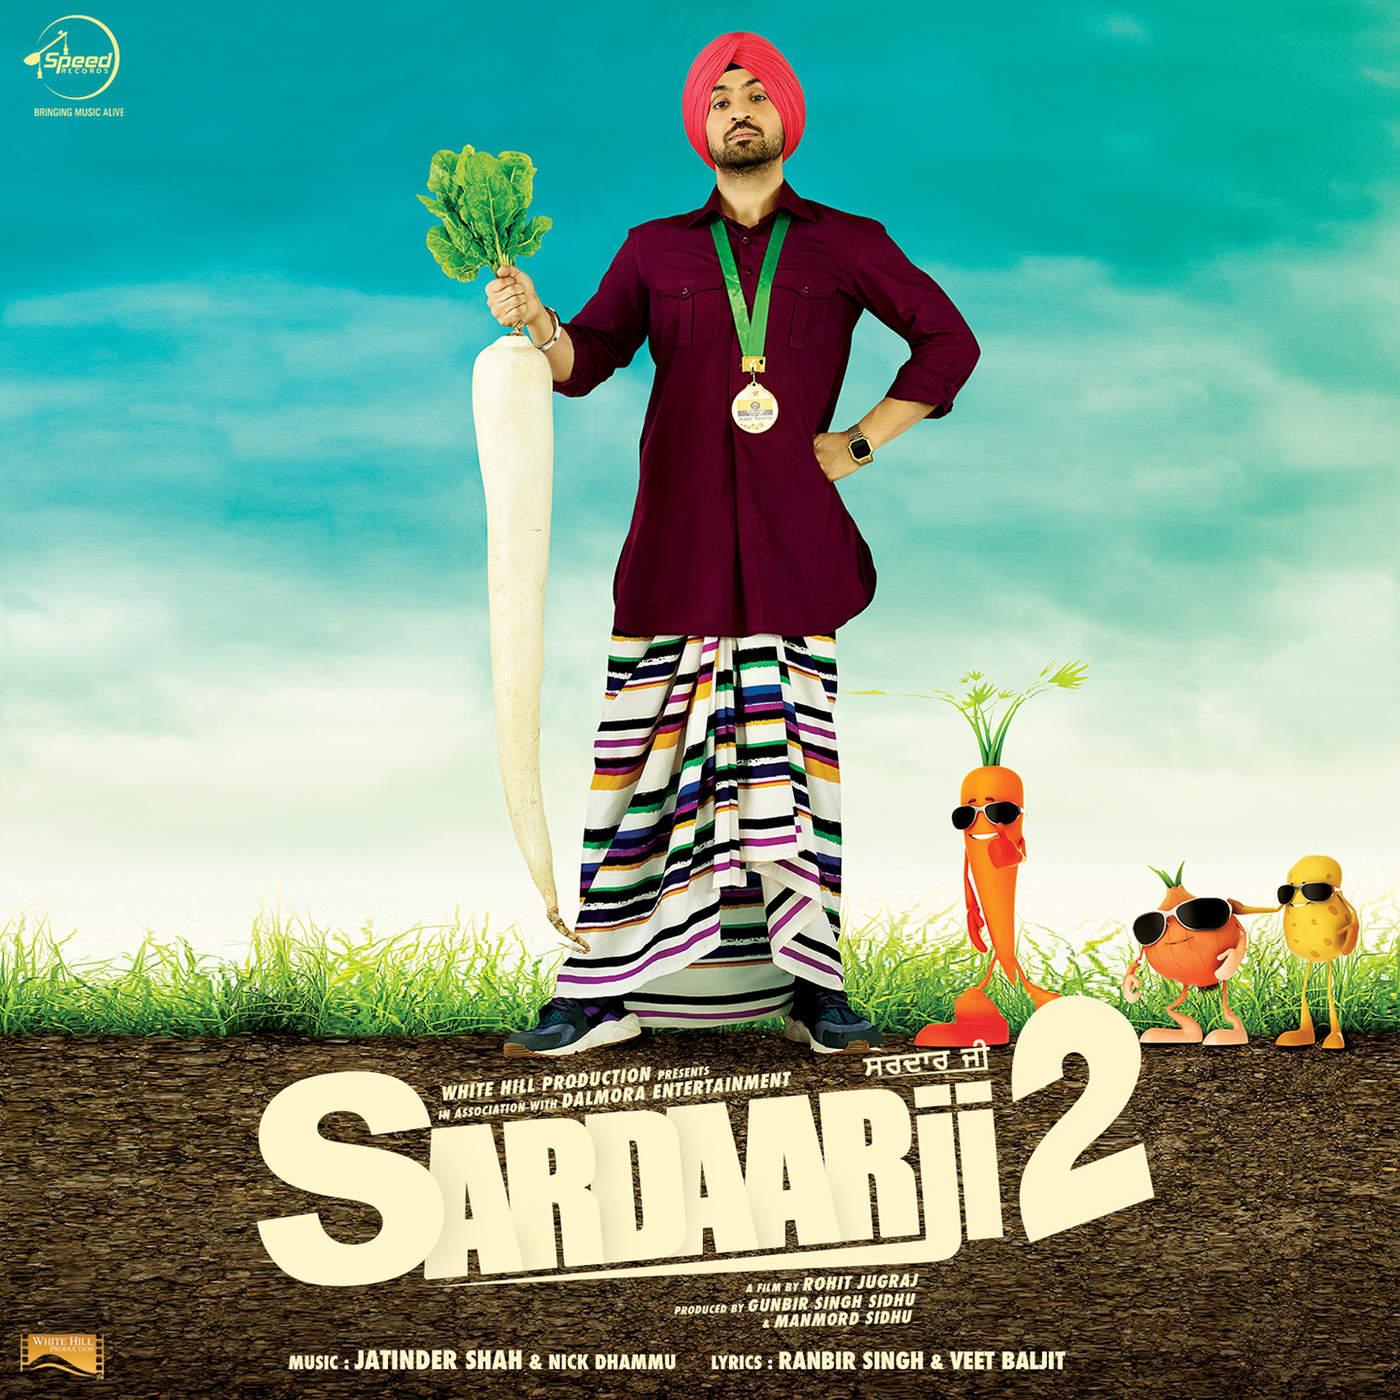 Jatinder Shah - Sardaarji 2 (Original Motion Picture Soundtrack) - EP